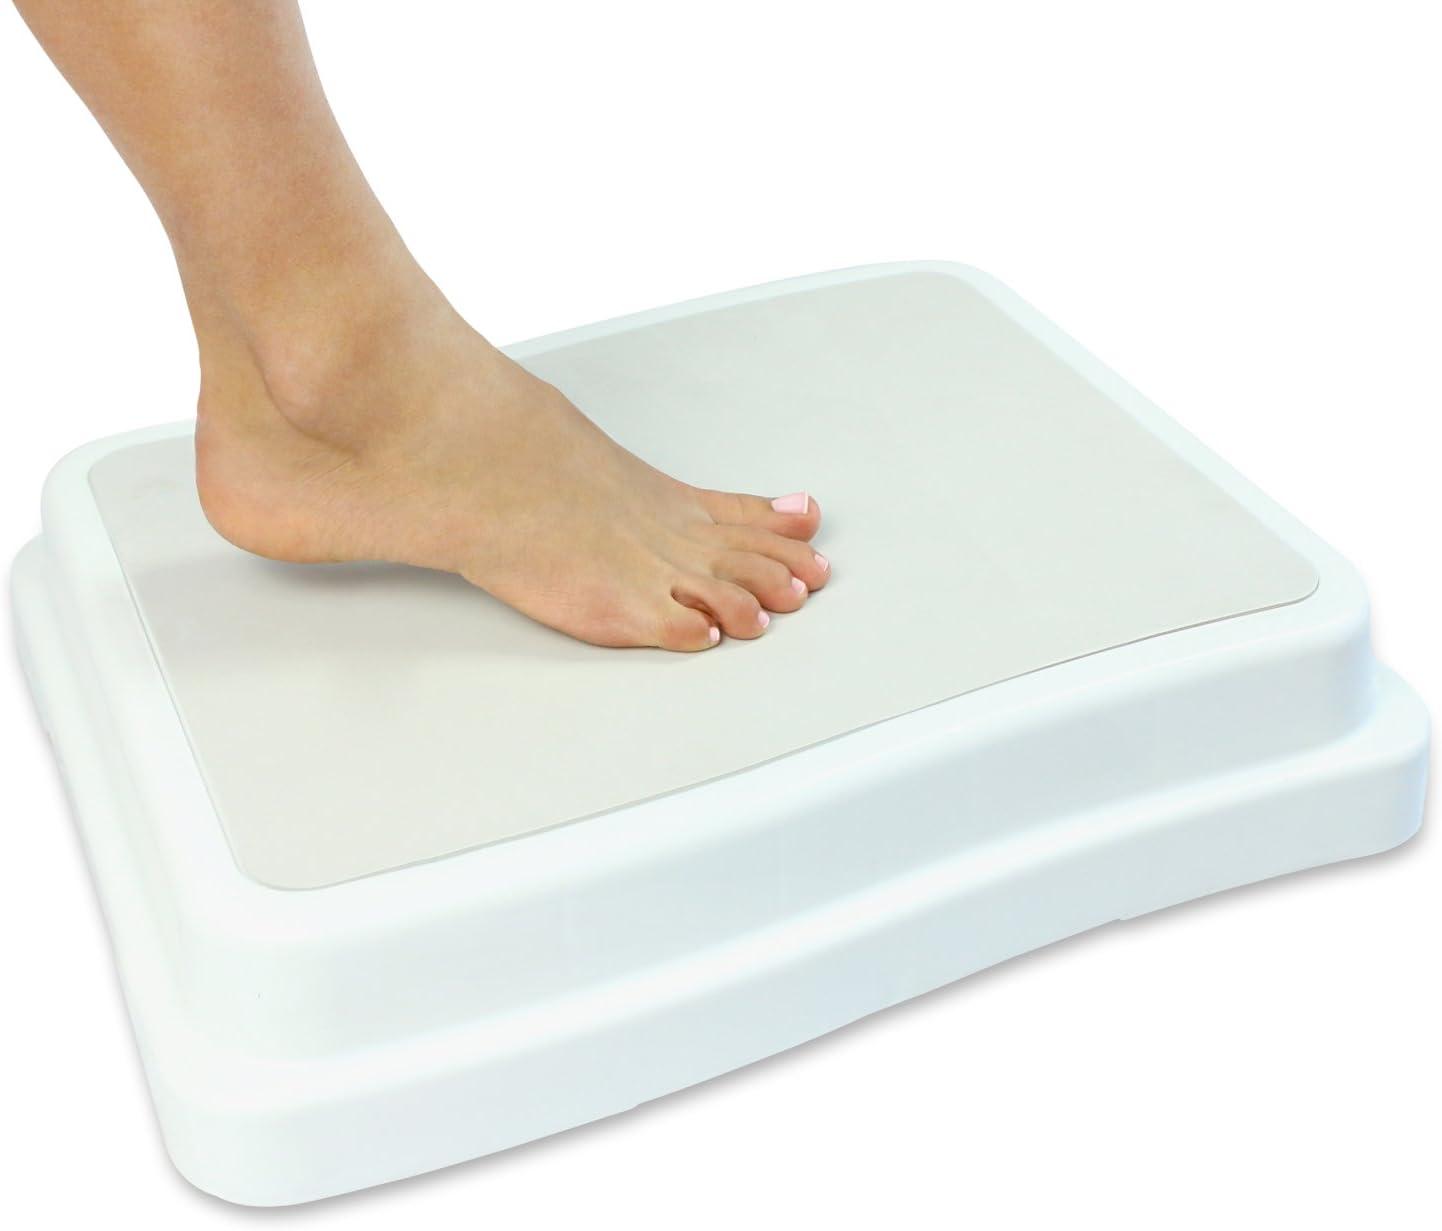 "Vive Bath Step (4"") - Slip Resistant Shower Stepping Stool - Elevated Bathroom Safety Aid for Handicap, Elderly, Seniors Entering, Exiting Bathtub - Nonslip Heavy Duty Bathtub, Bed, Kitchen Elevator"